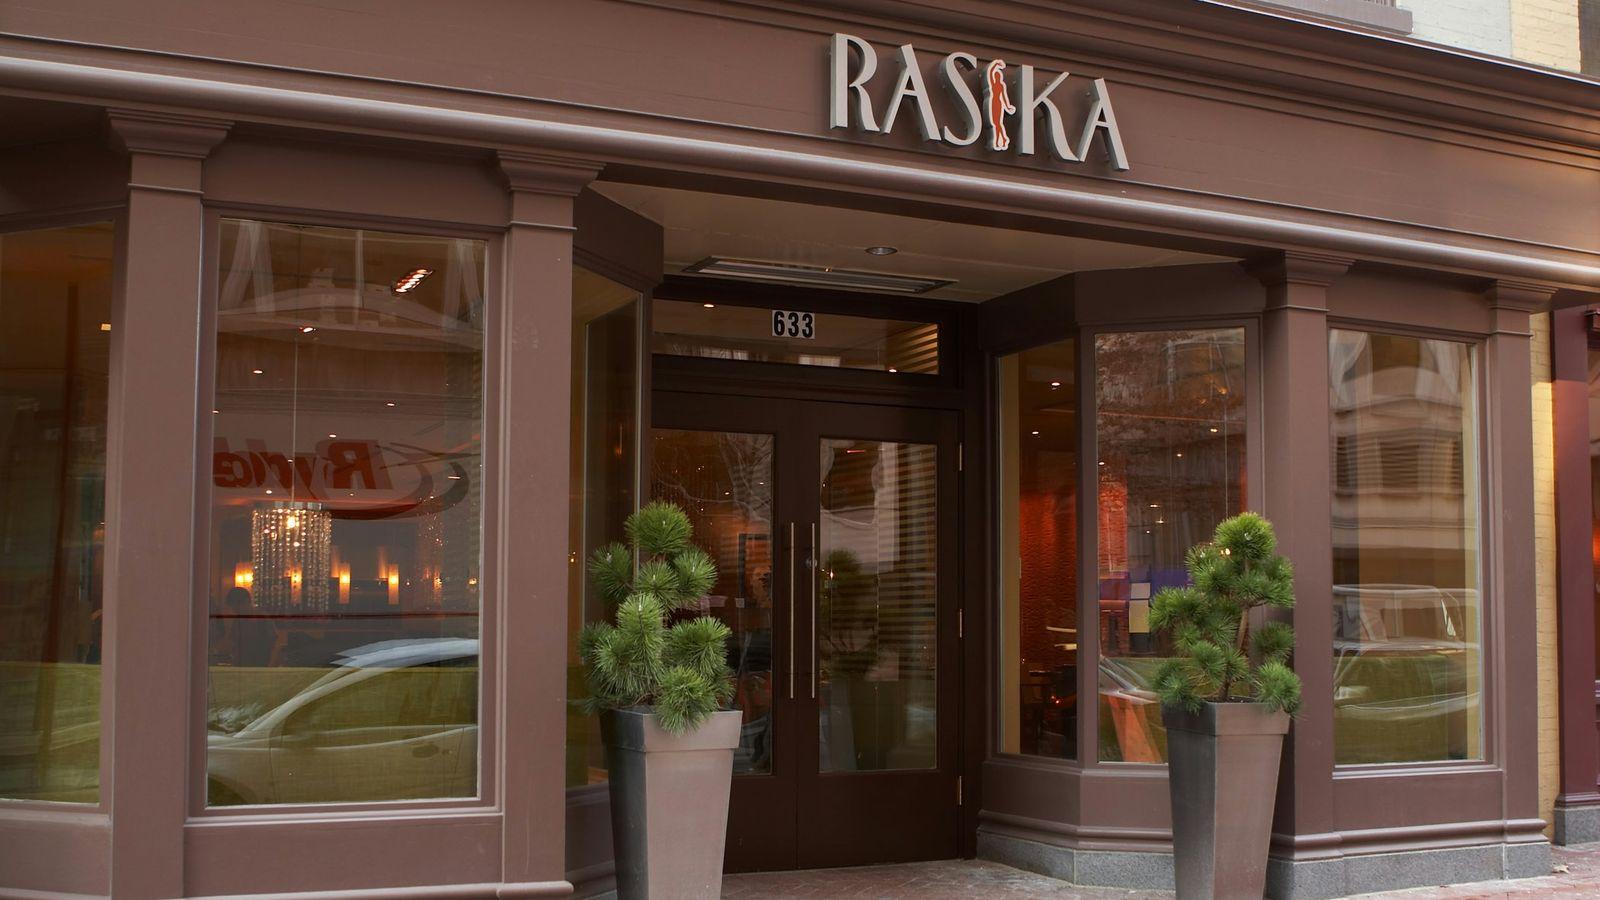 Rasika Restaurant In Usa Dc